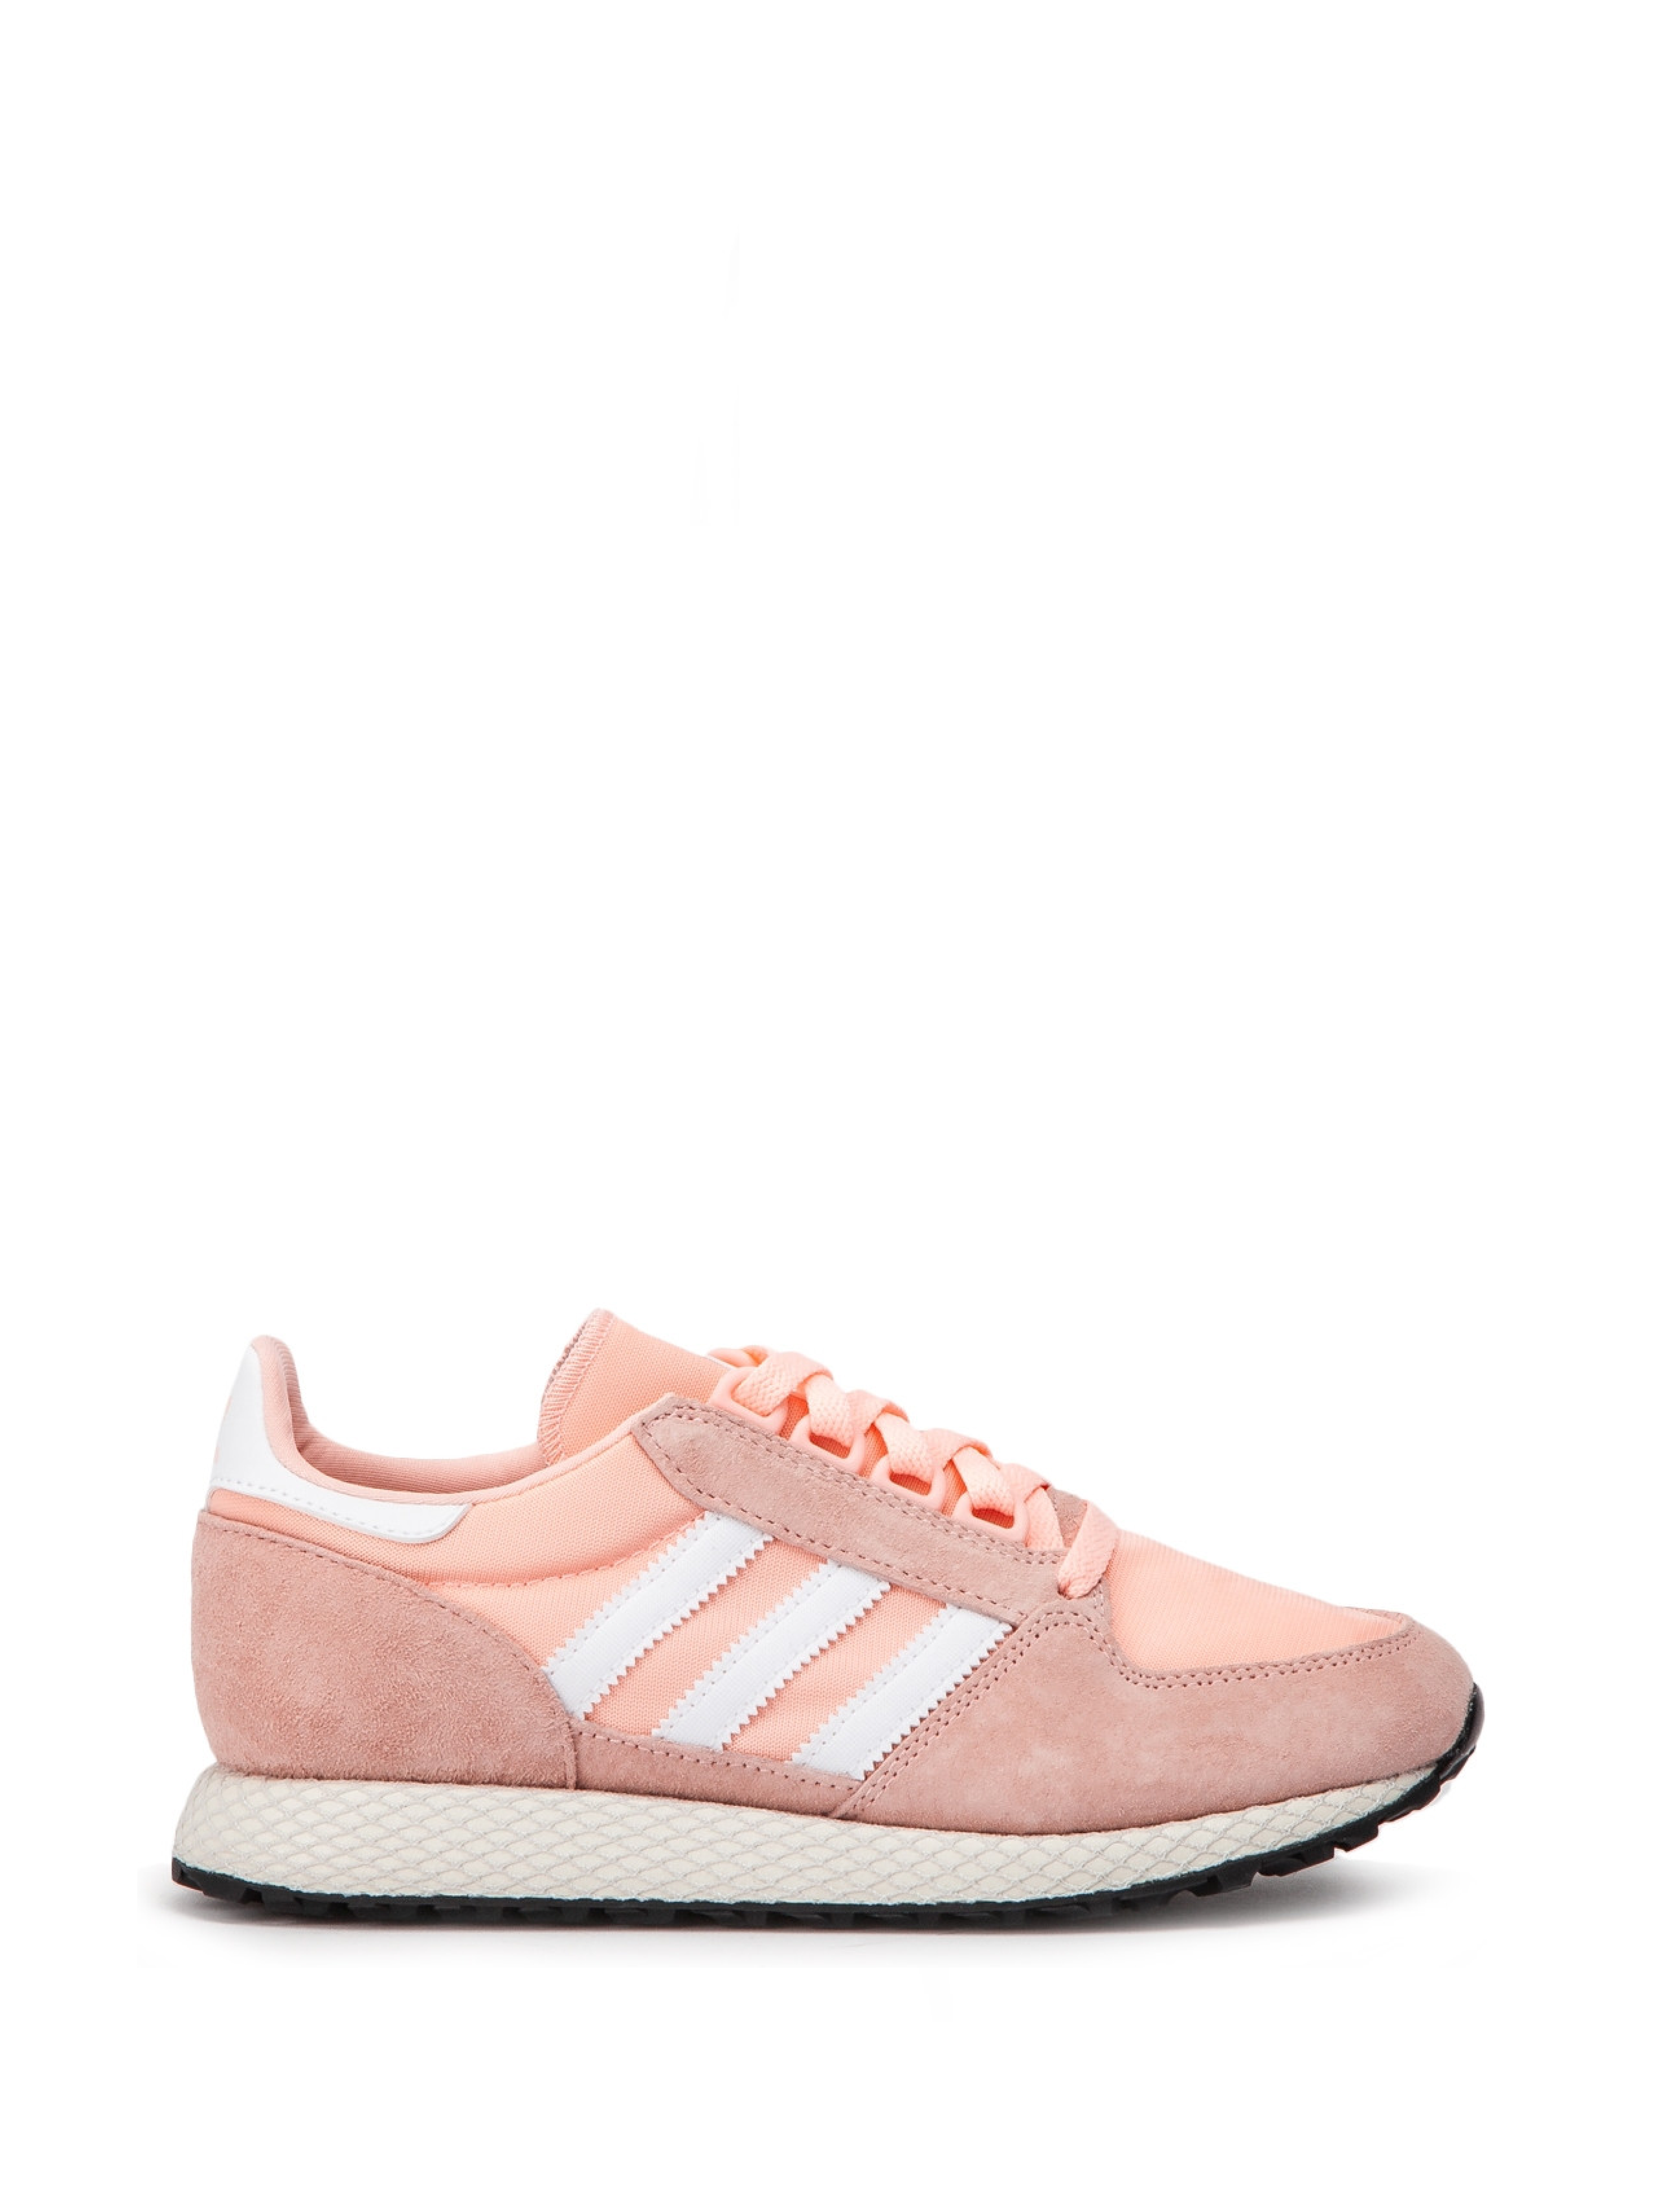 Forest Grove Кроссовки Adidas ASA280920-22 38  Розовый Free Style